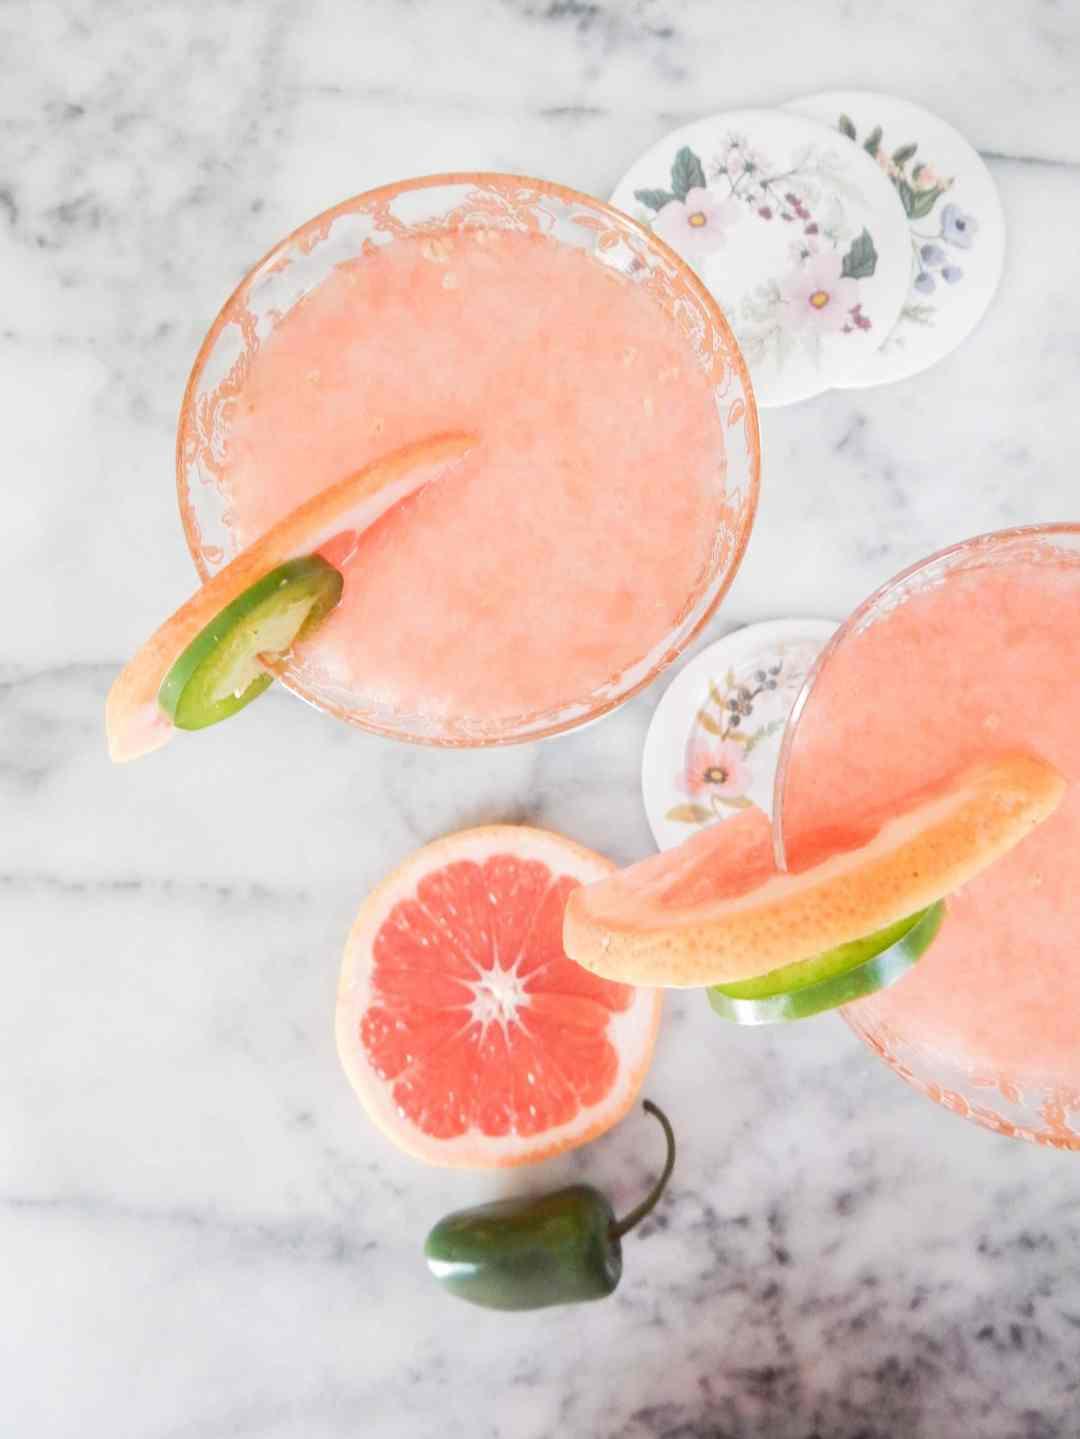 Best Paloma Recipe - Tequila, Fresh Pink Grapefruit